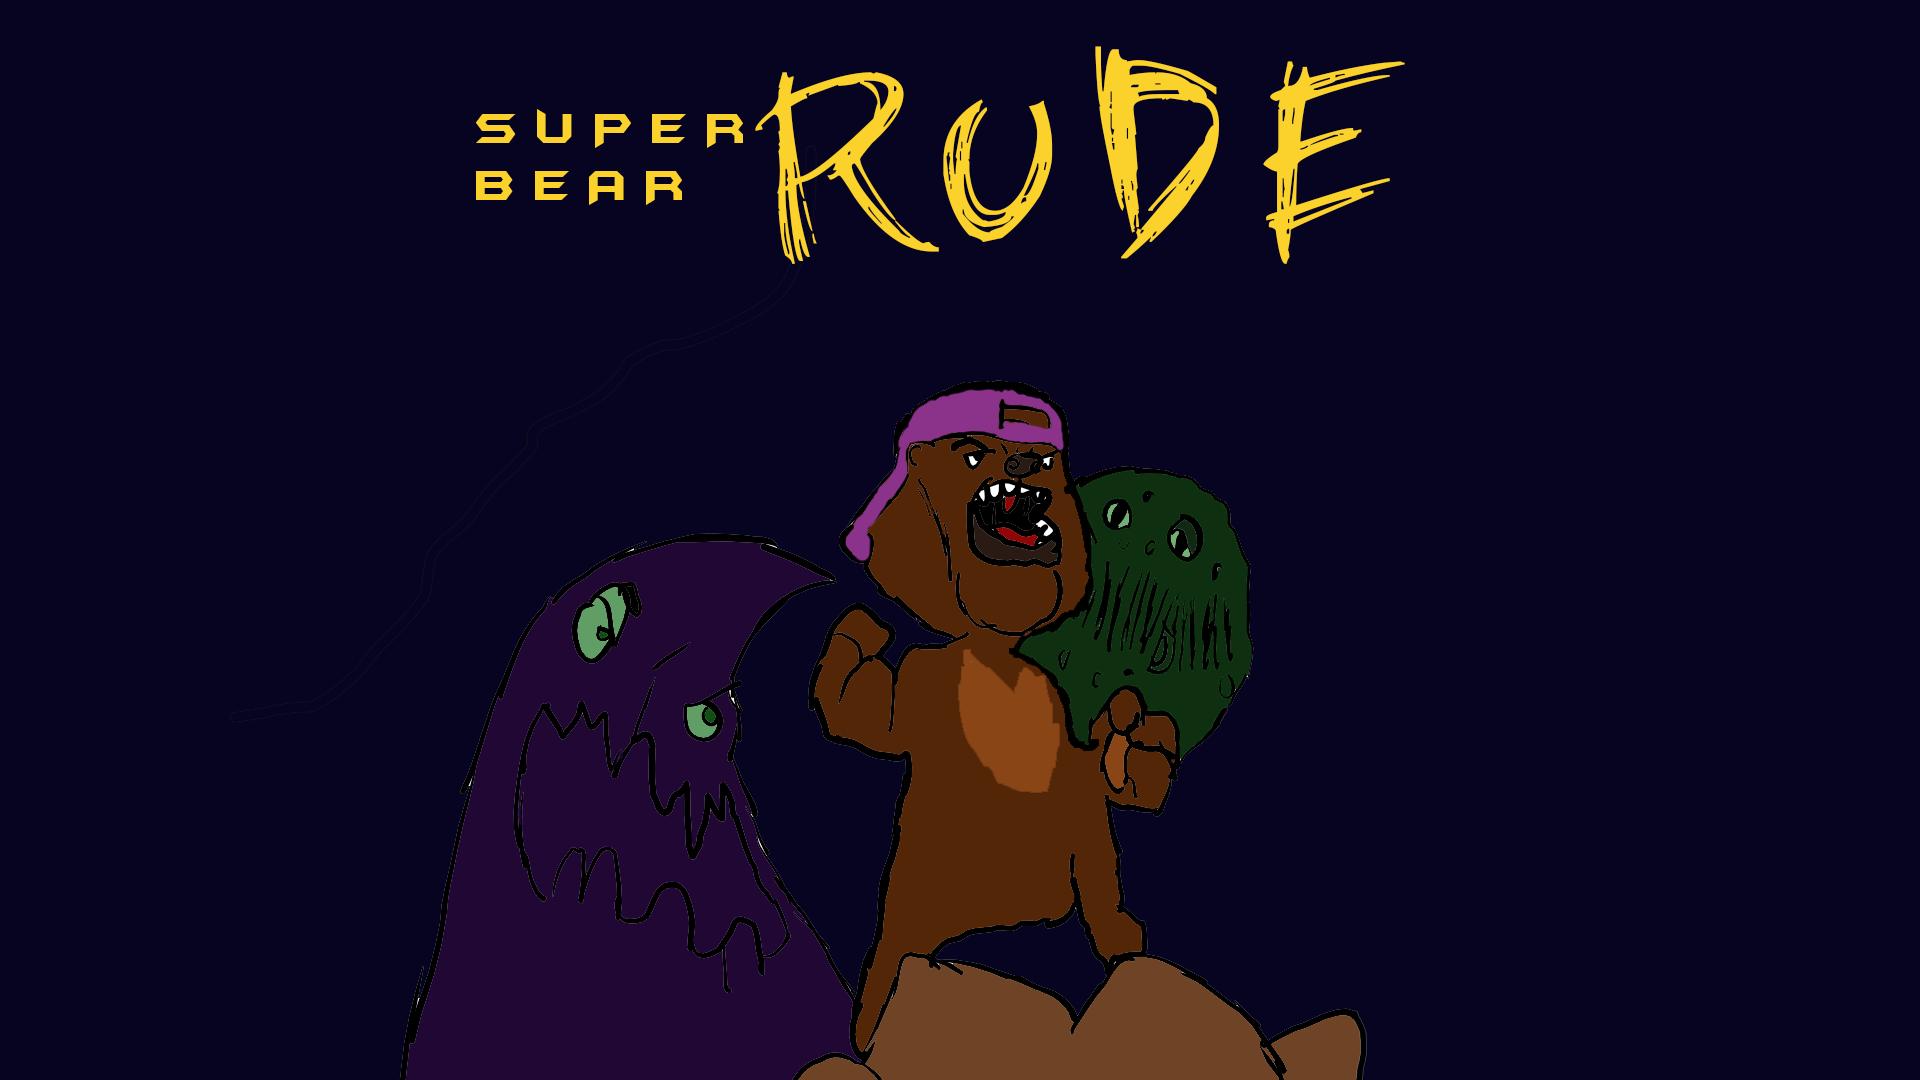 Super Rude Bear Art Contest Submission